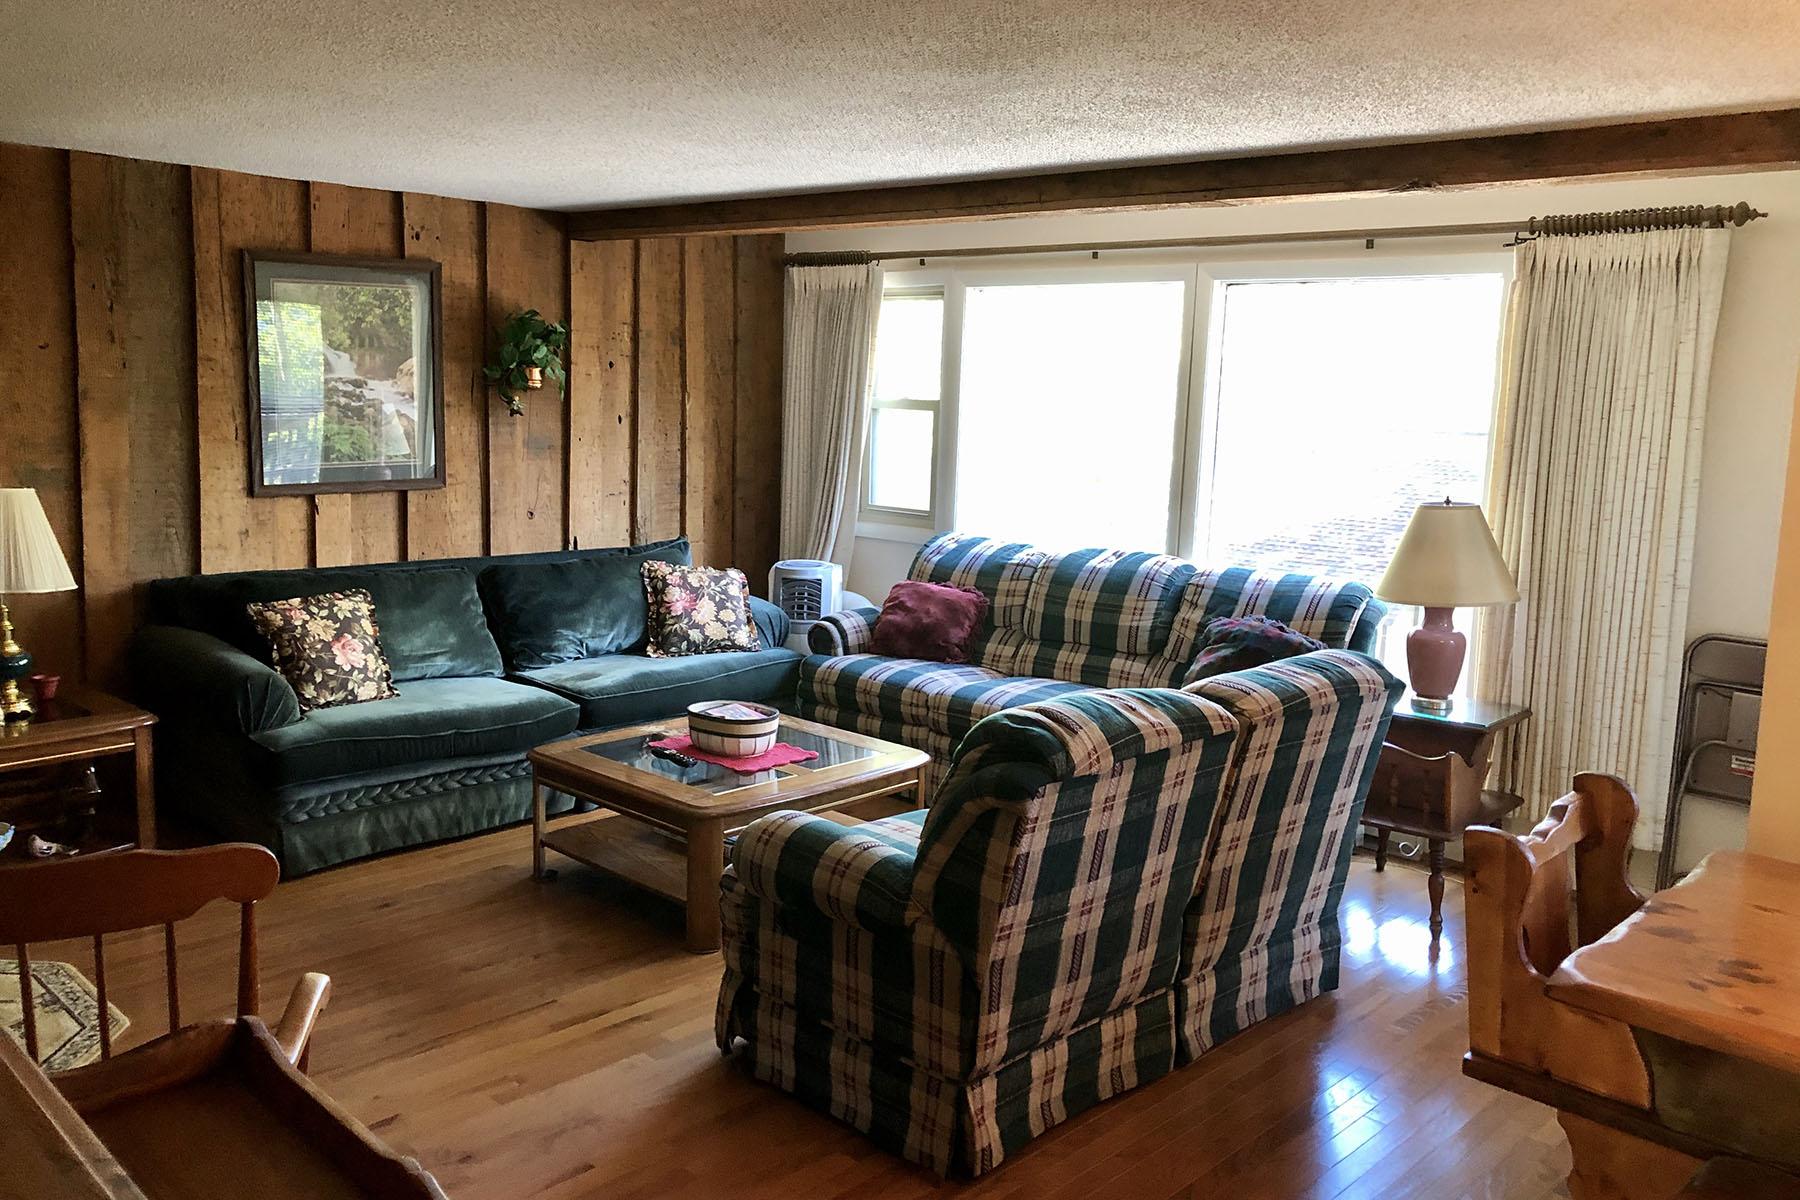 Single Family Homes for Sale at SUGAR MOUNTAIN - HEMLOCK NOB 1317 Sugar Mountain Dr , M-55 Sugar Mountain, North Carolina 28604 United States